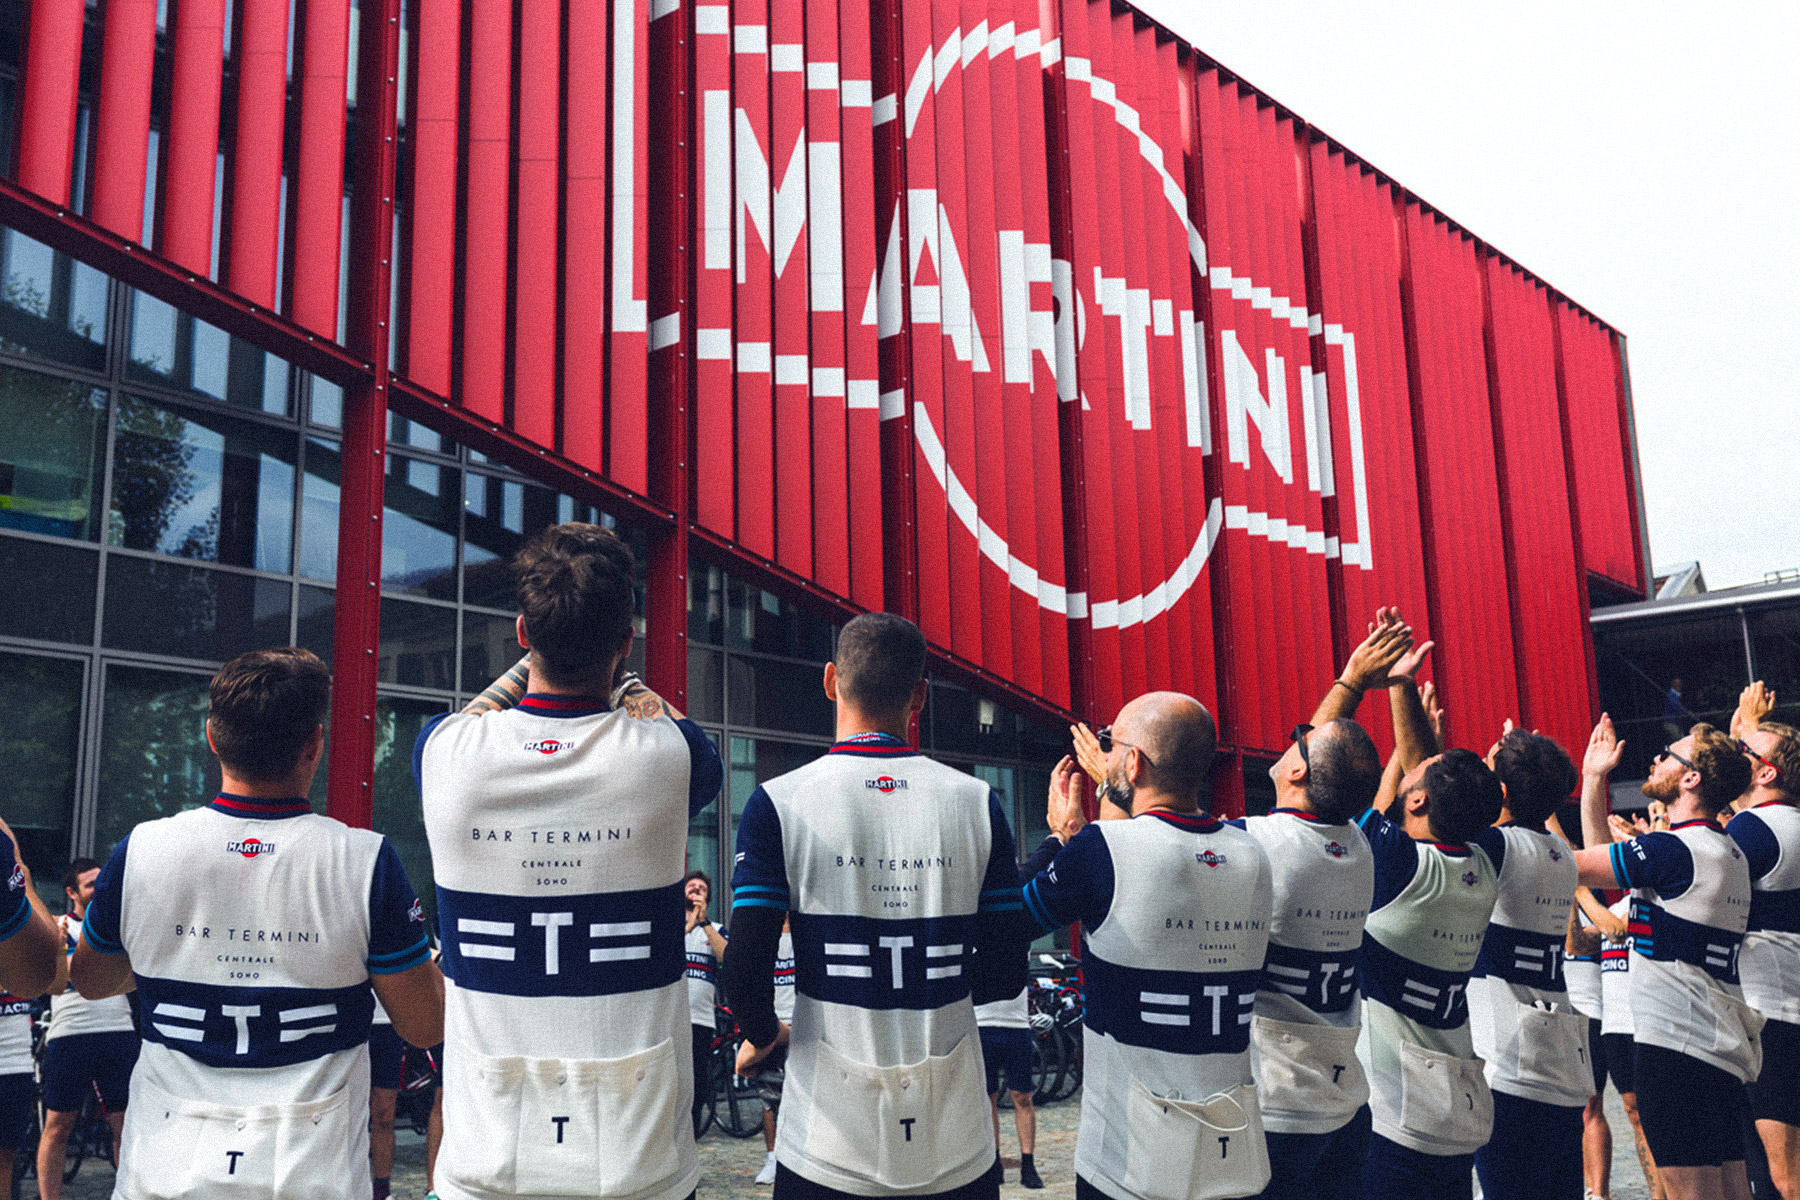 Milano-Torino – Studio AS-CC